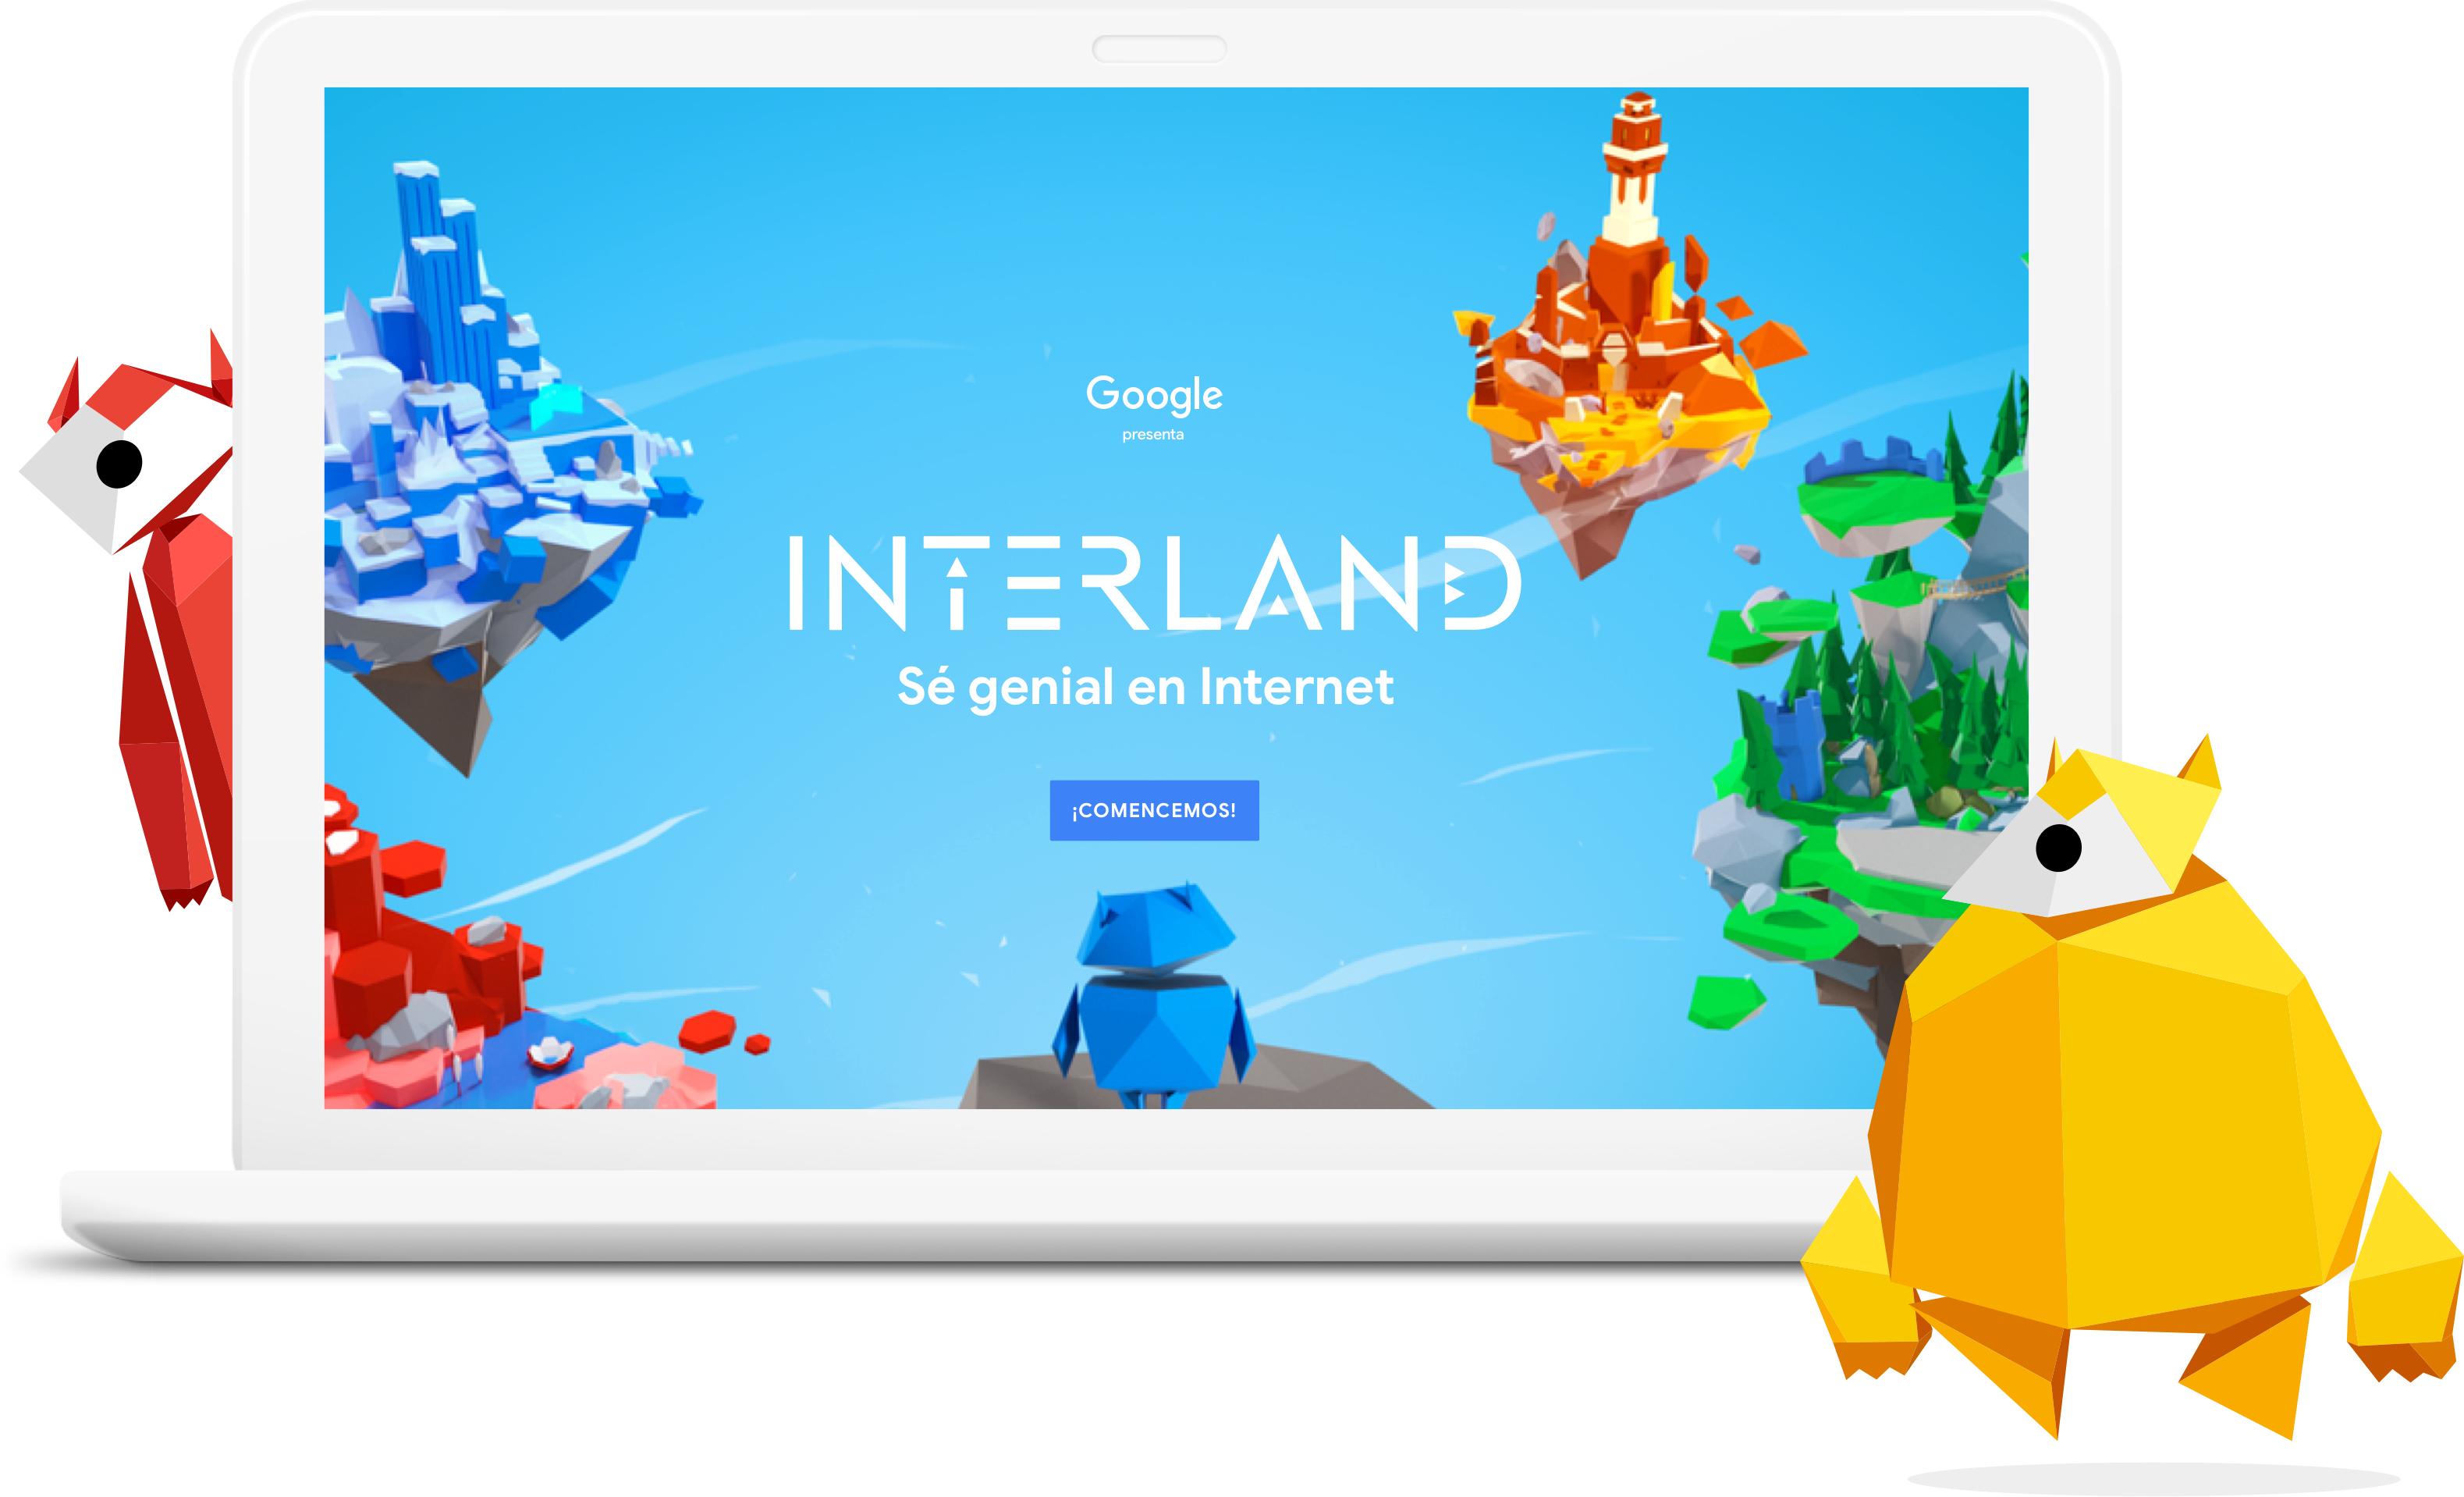 """Sé genial en Internet"": La fórmula de Google para navegar de manera segura en línea"